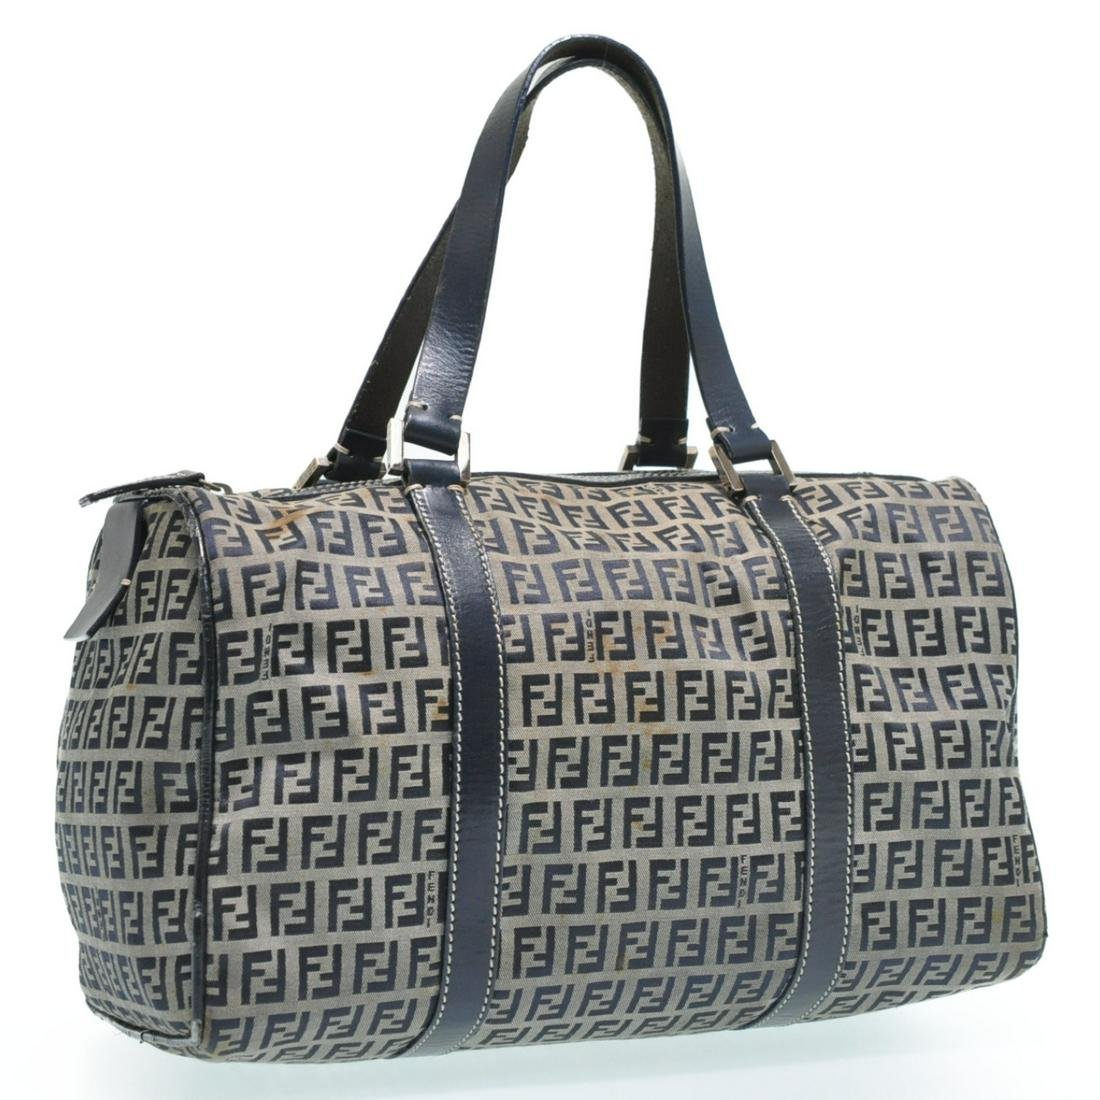 Authentic FENDI Canvas Hand Bag